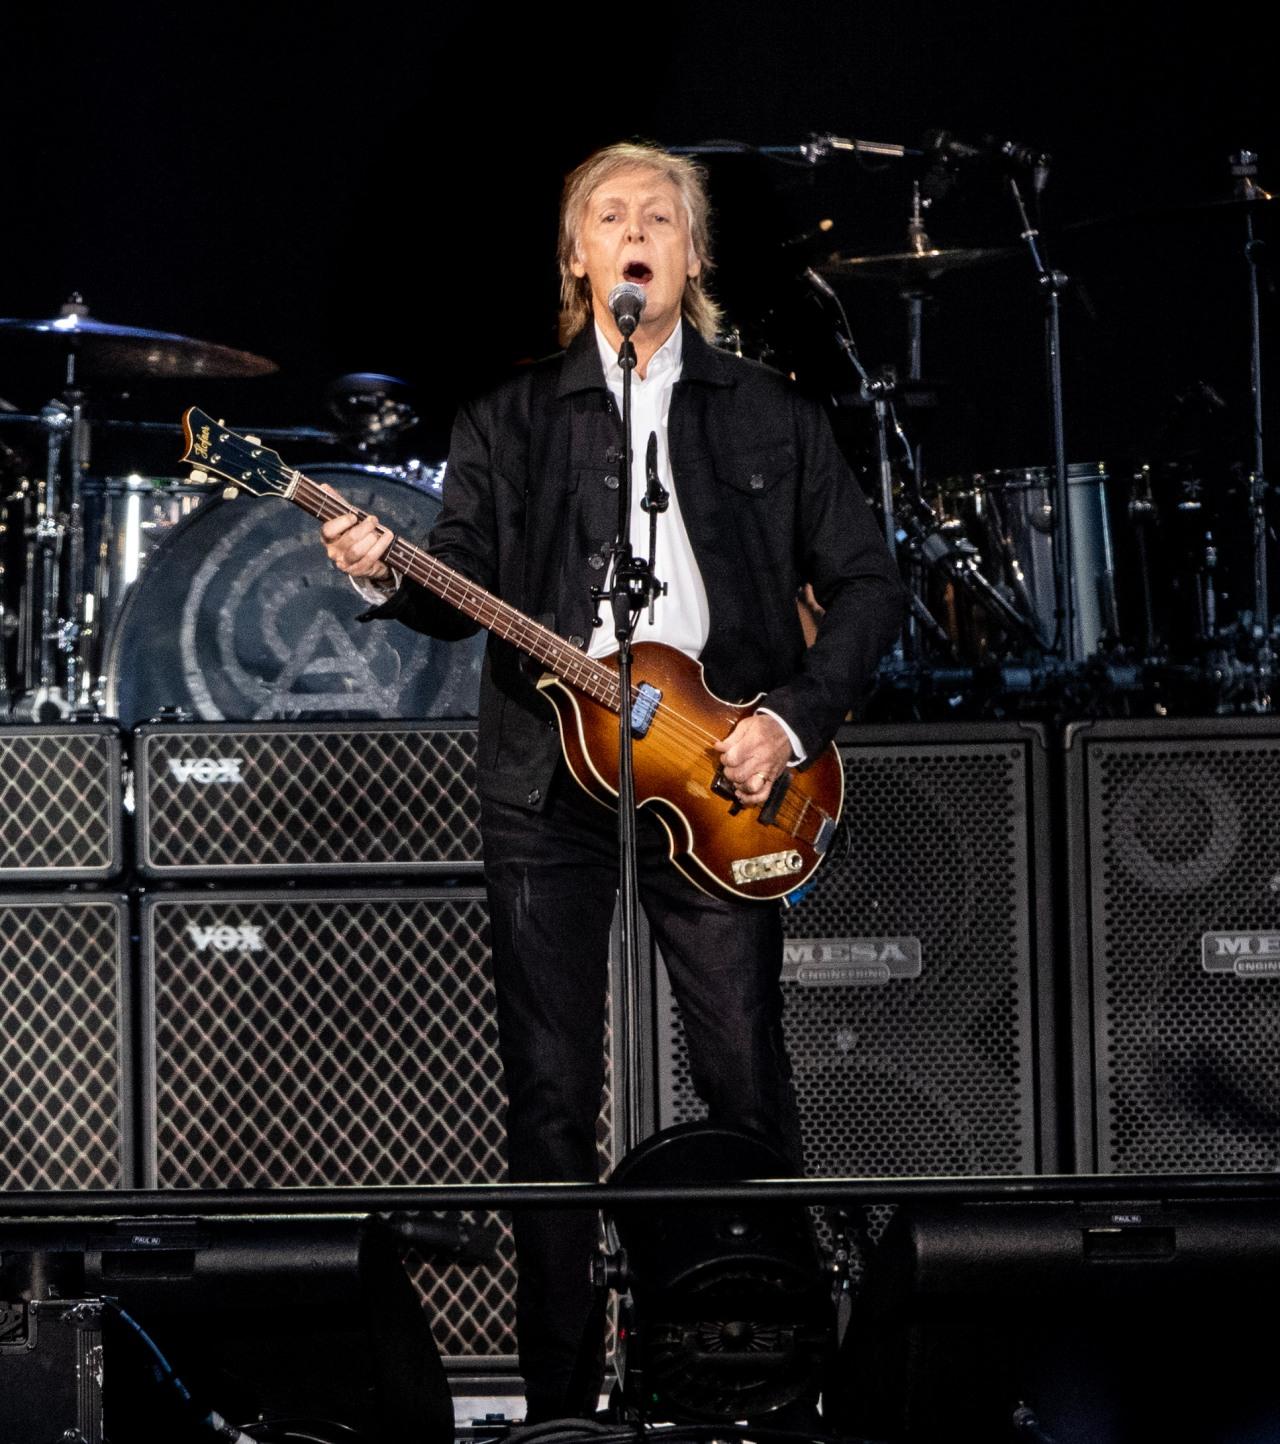 Sir Paul McCartney Played a Brilliant Set inTexas